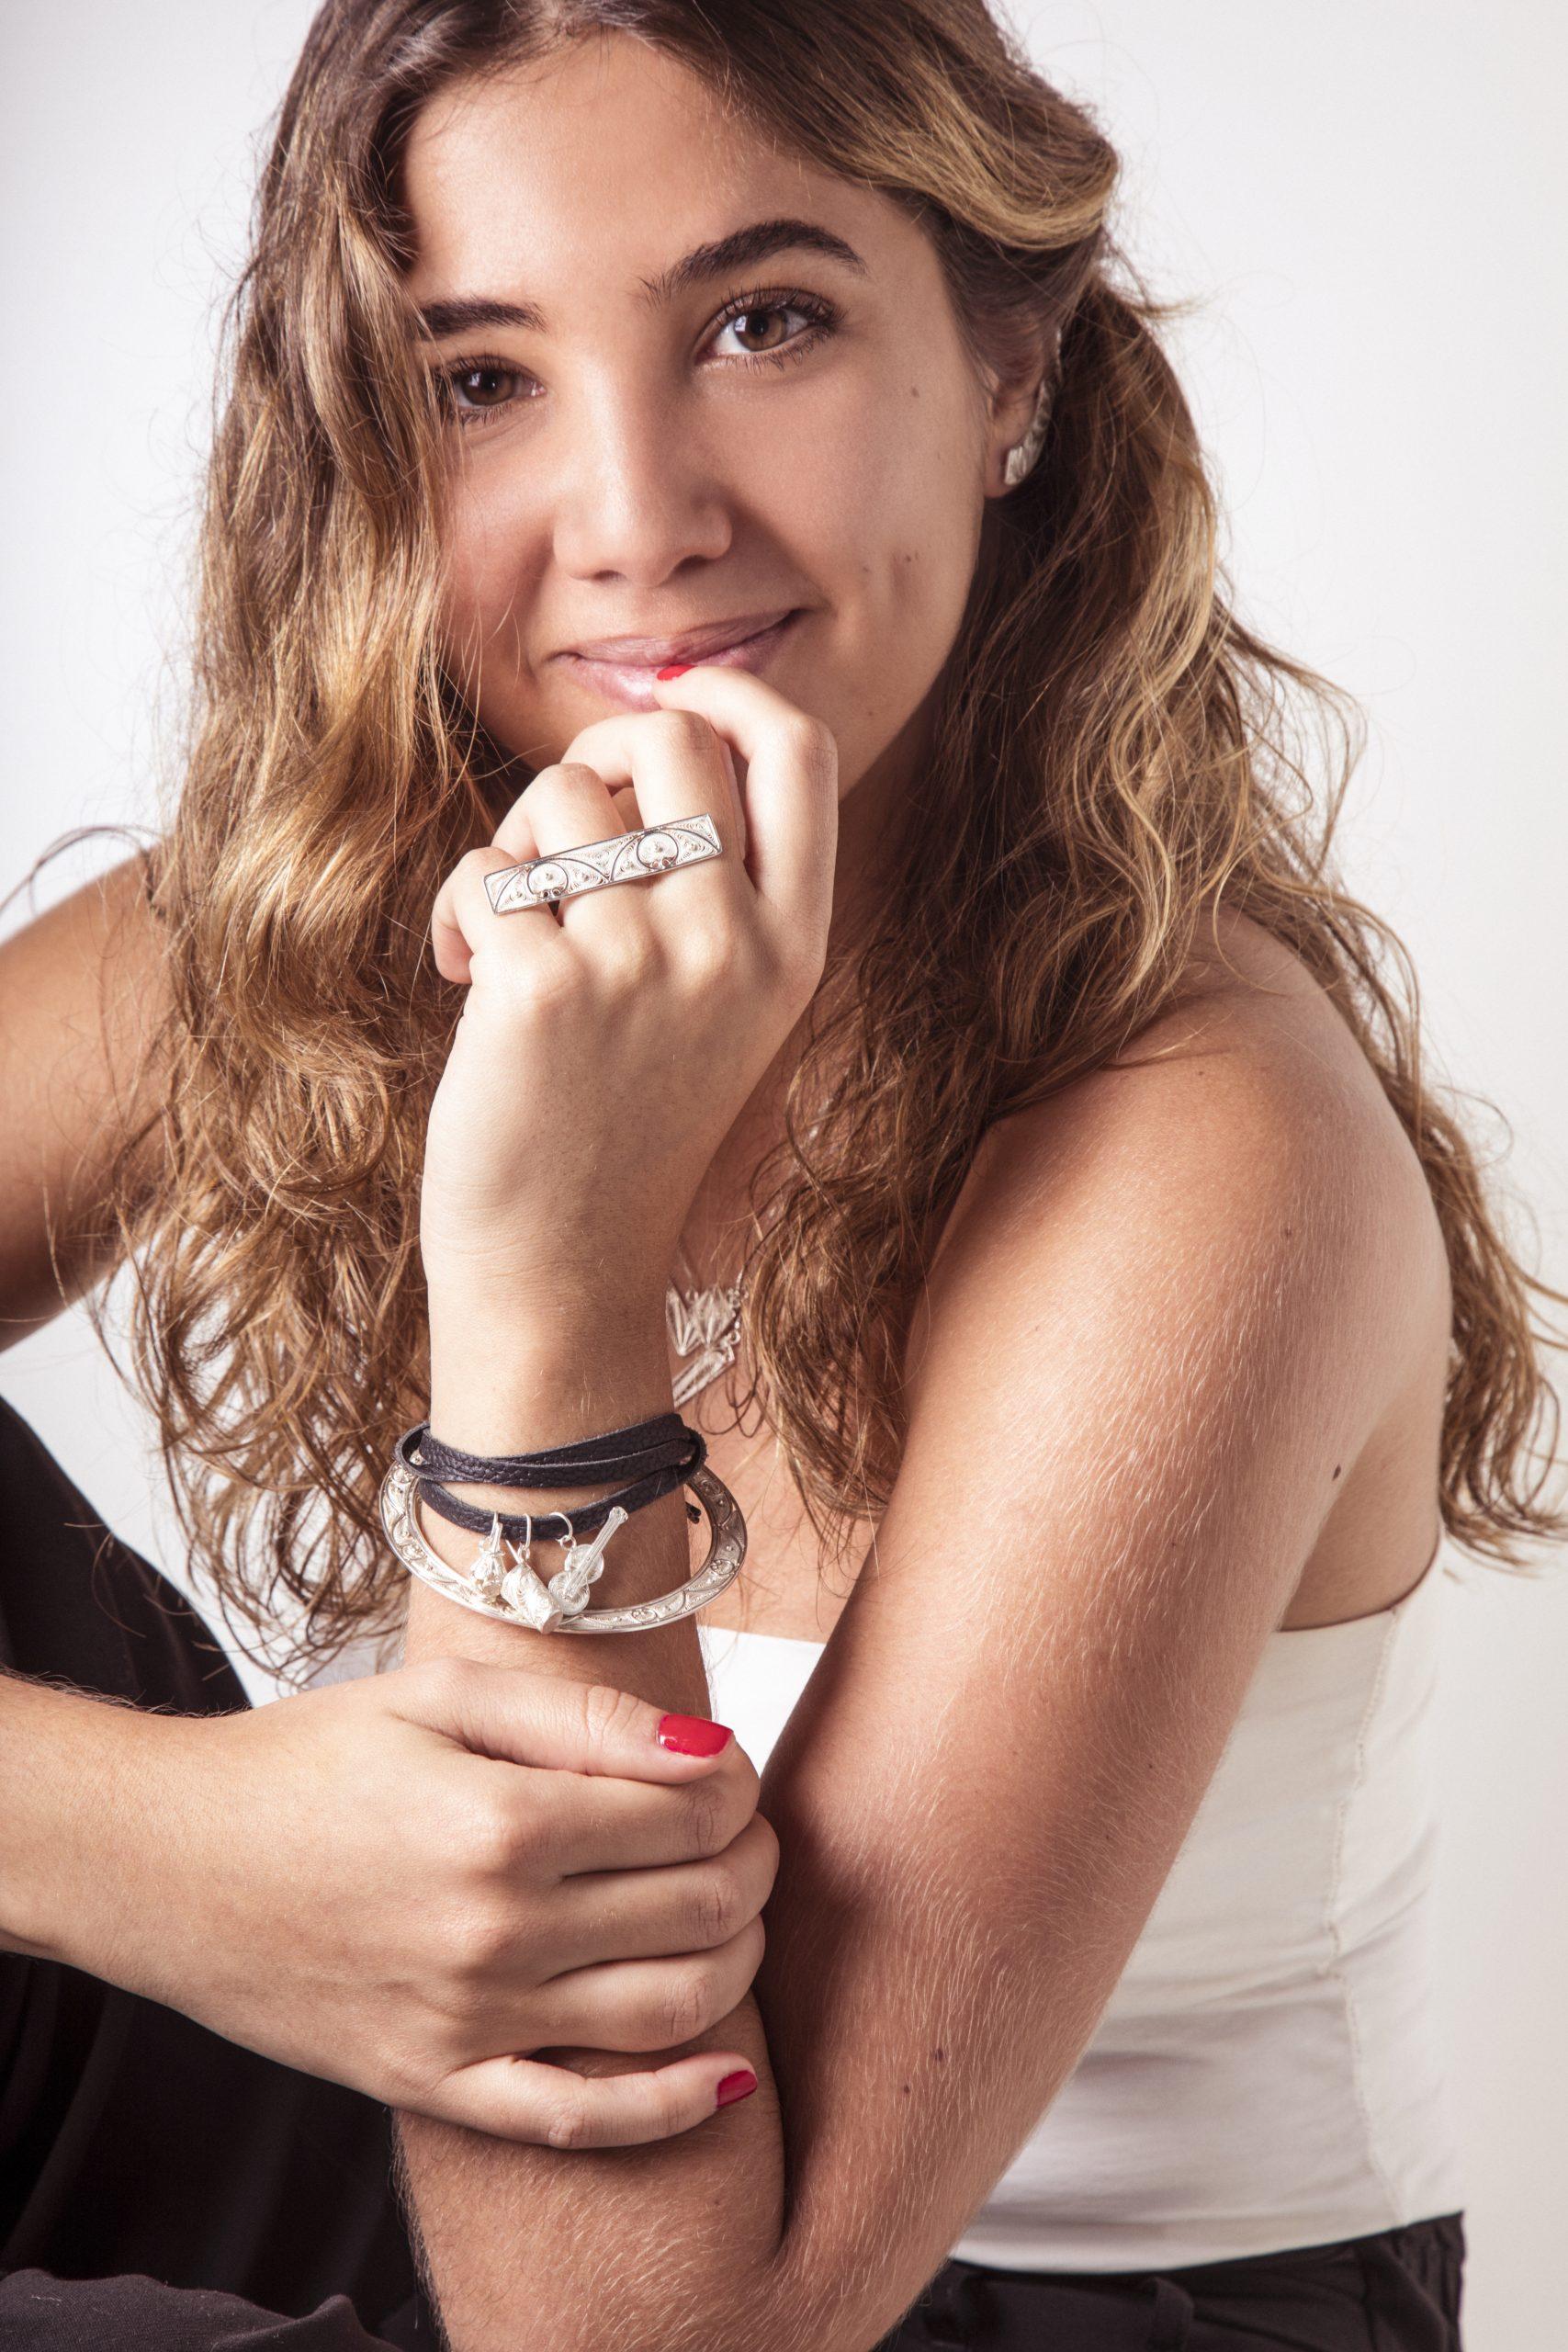 Antonella Scavone, creadora de Toni Gie. Foto: Gentileza.